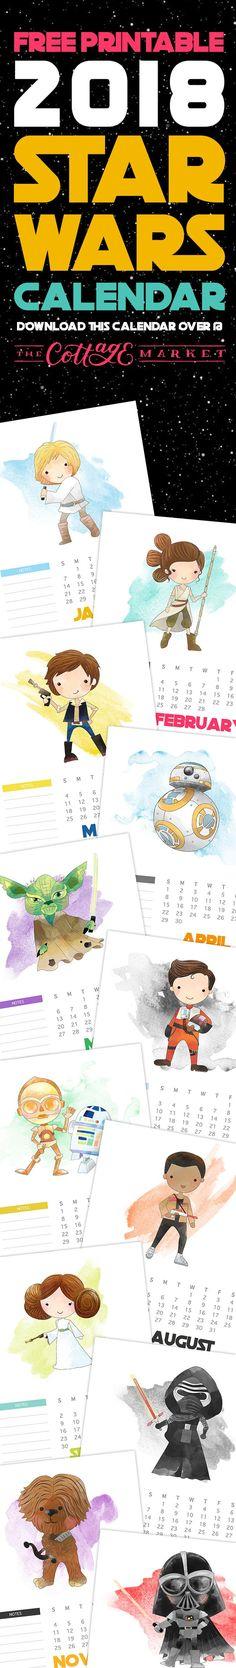 2018 Star Wars calendar! Free printable!